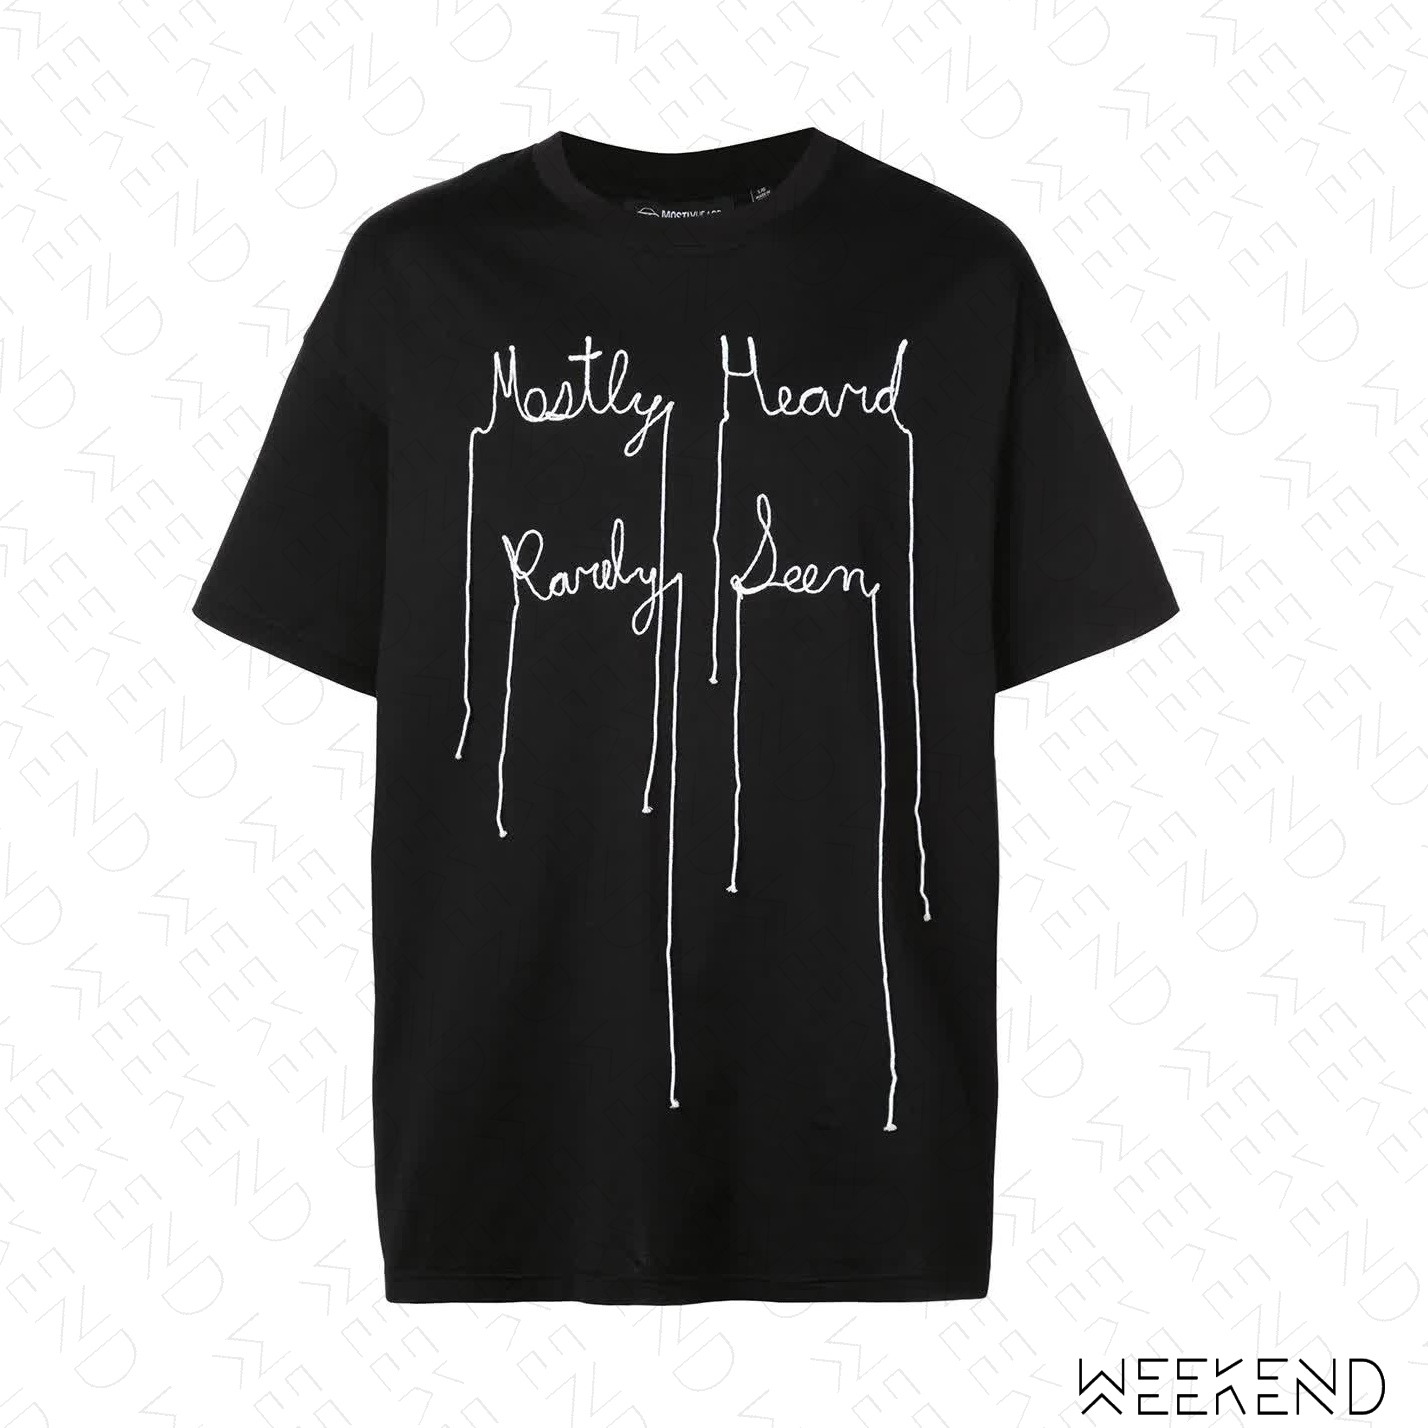 【WEEKEND】 MOSTLT HEARD RARELY SEEN MHRS 草寫文字 脫線效果 短袖 T恤 黑色